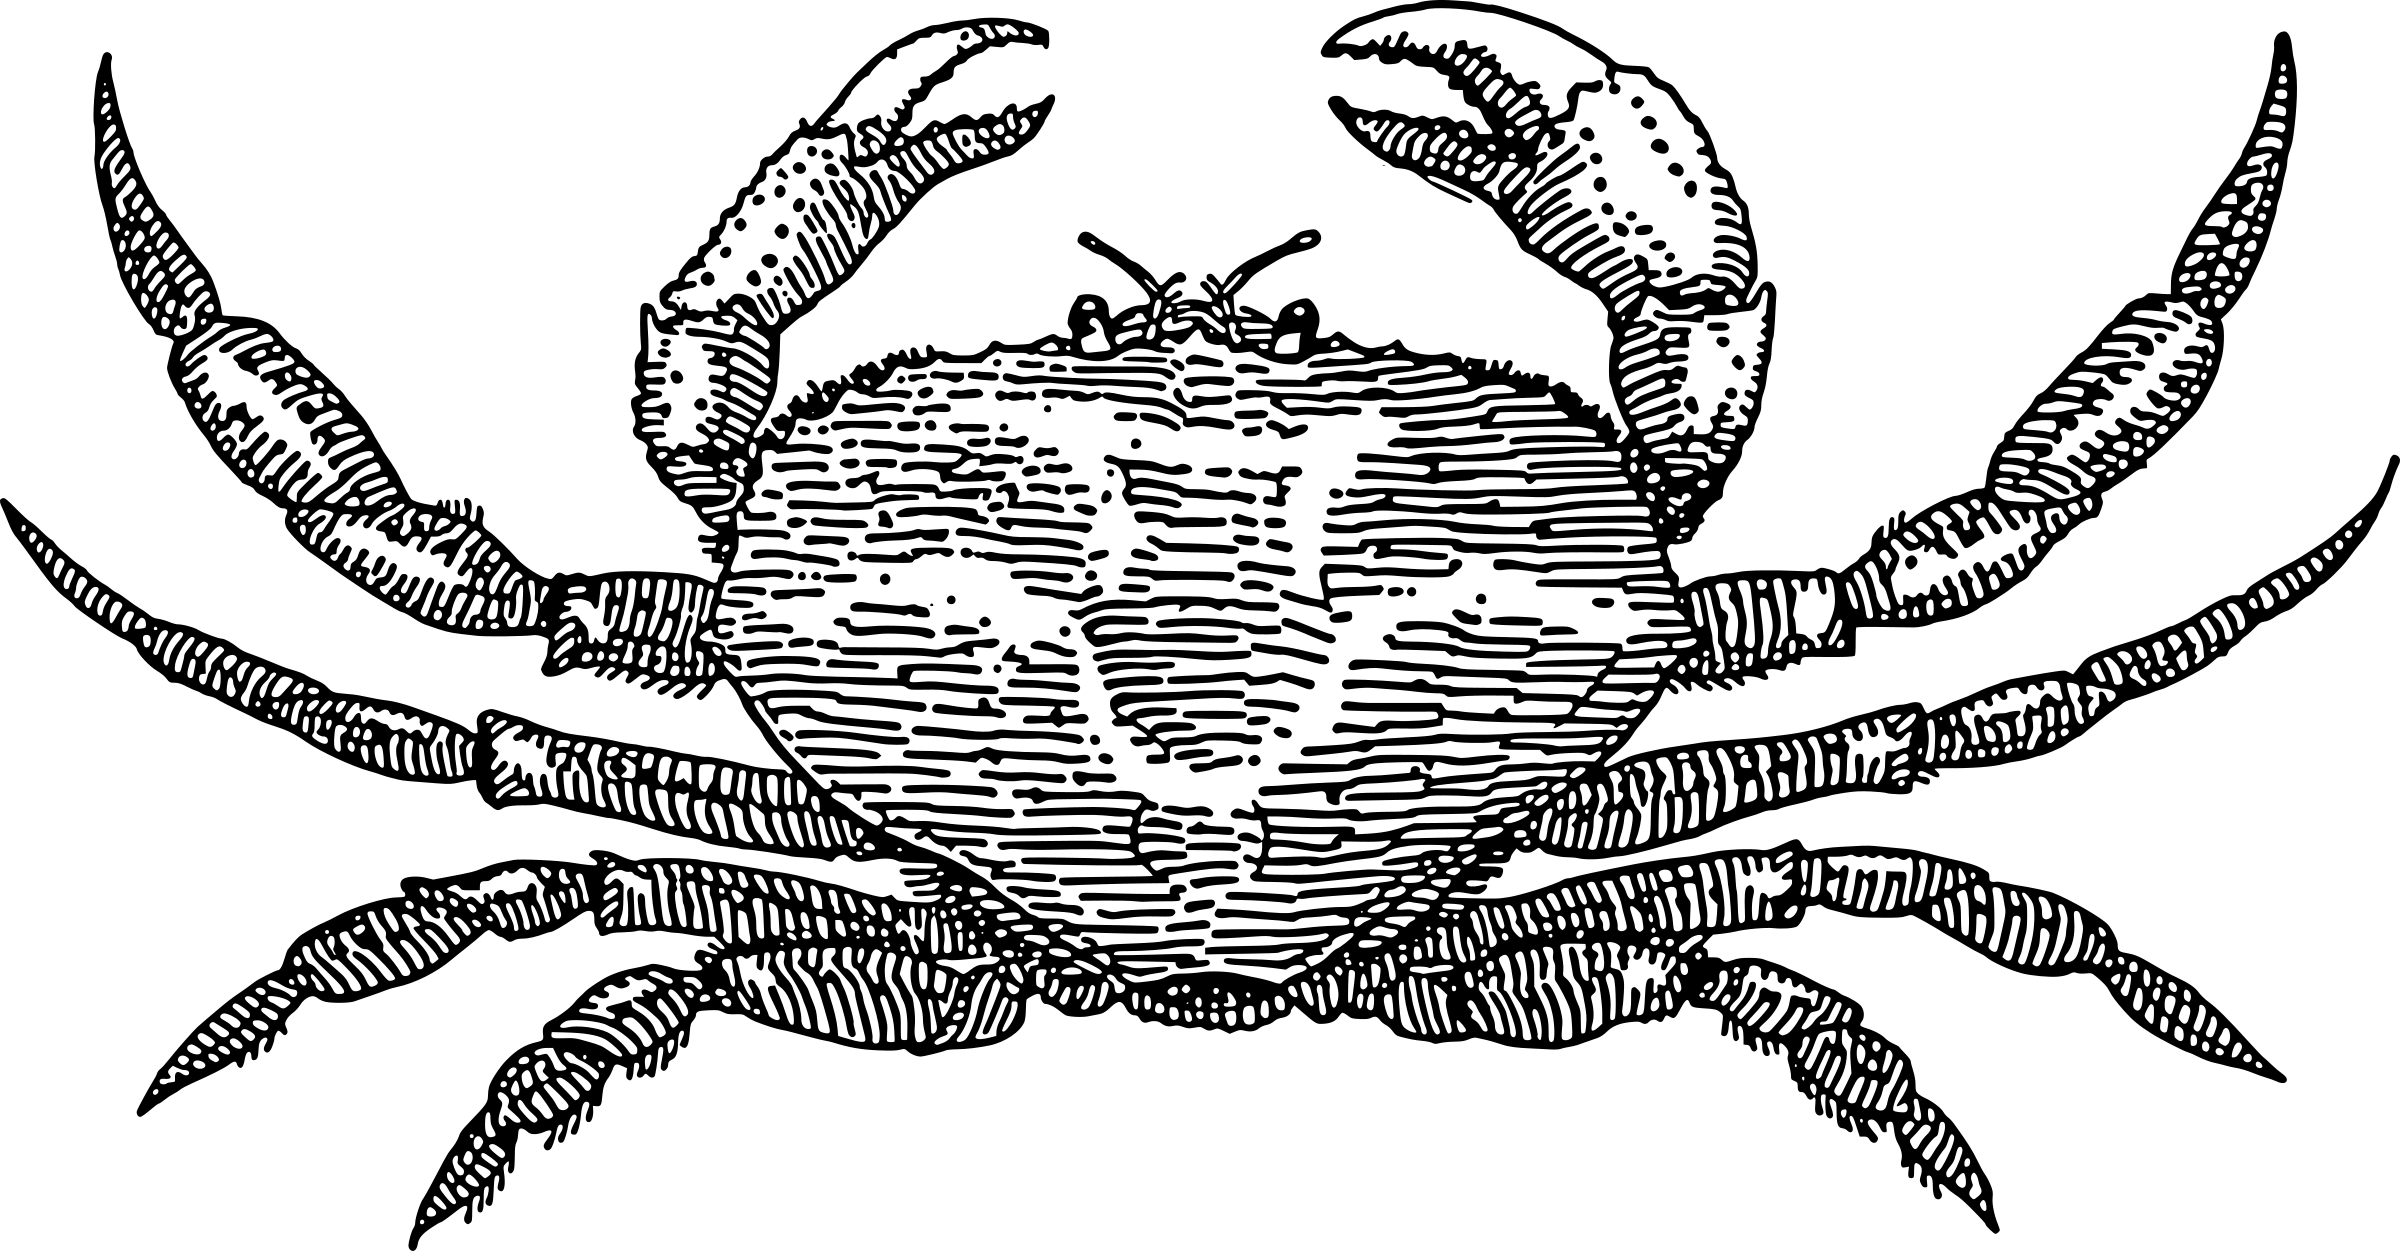 Crab clipart arthropoda. Black and white bclipart